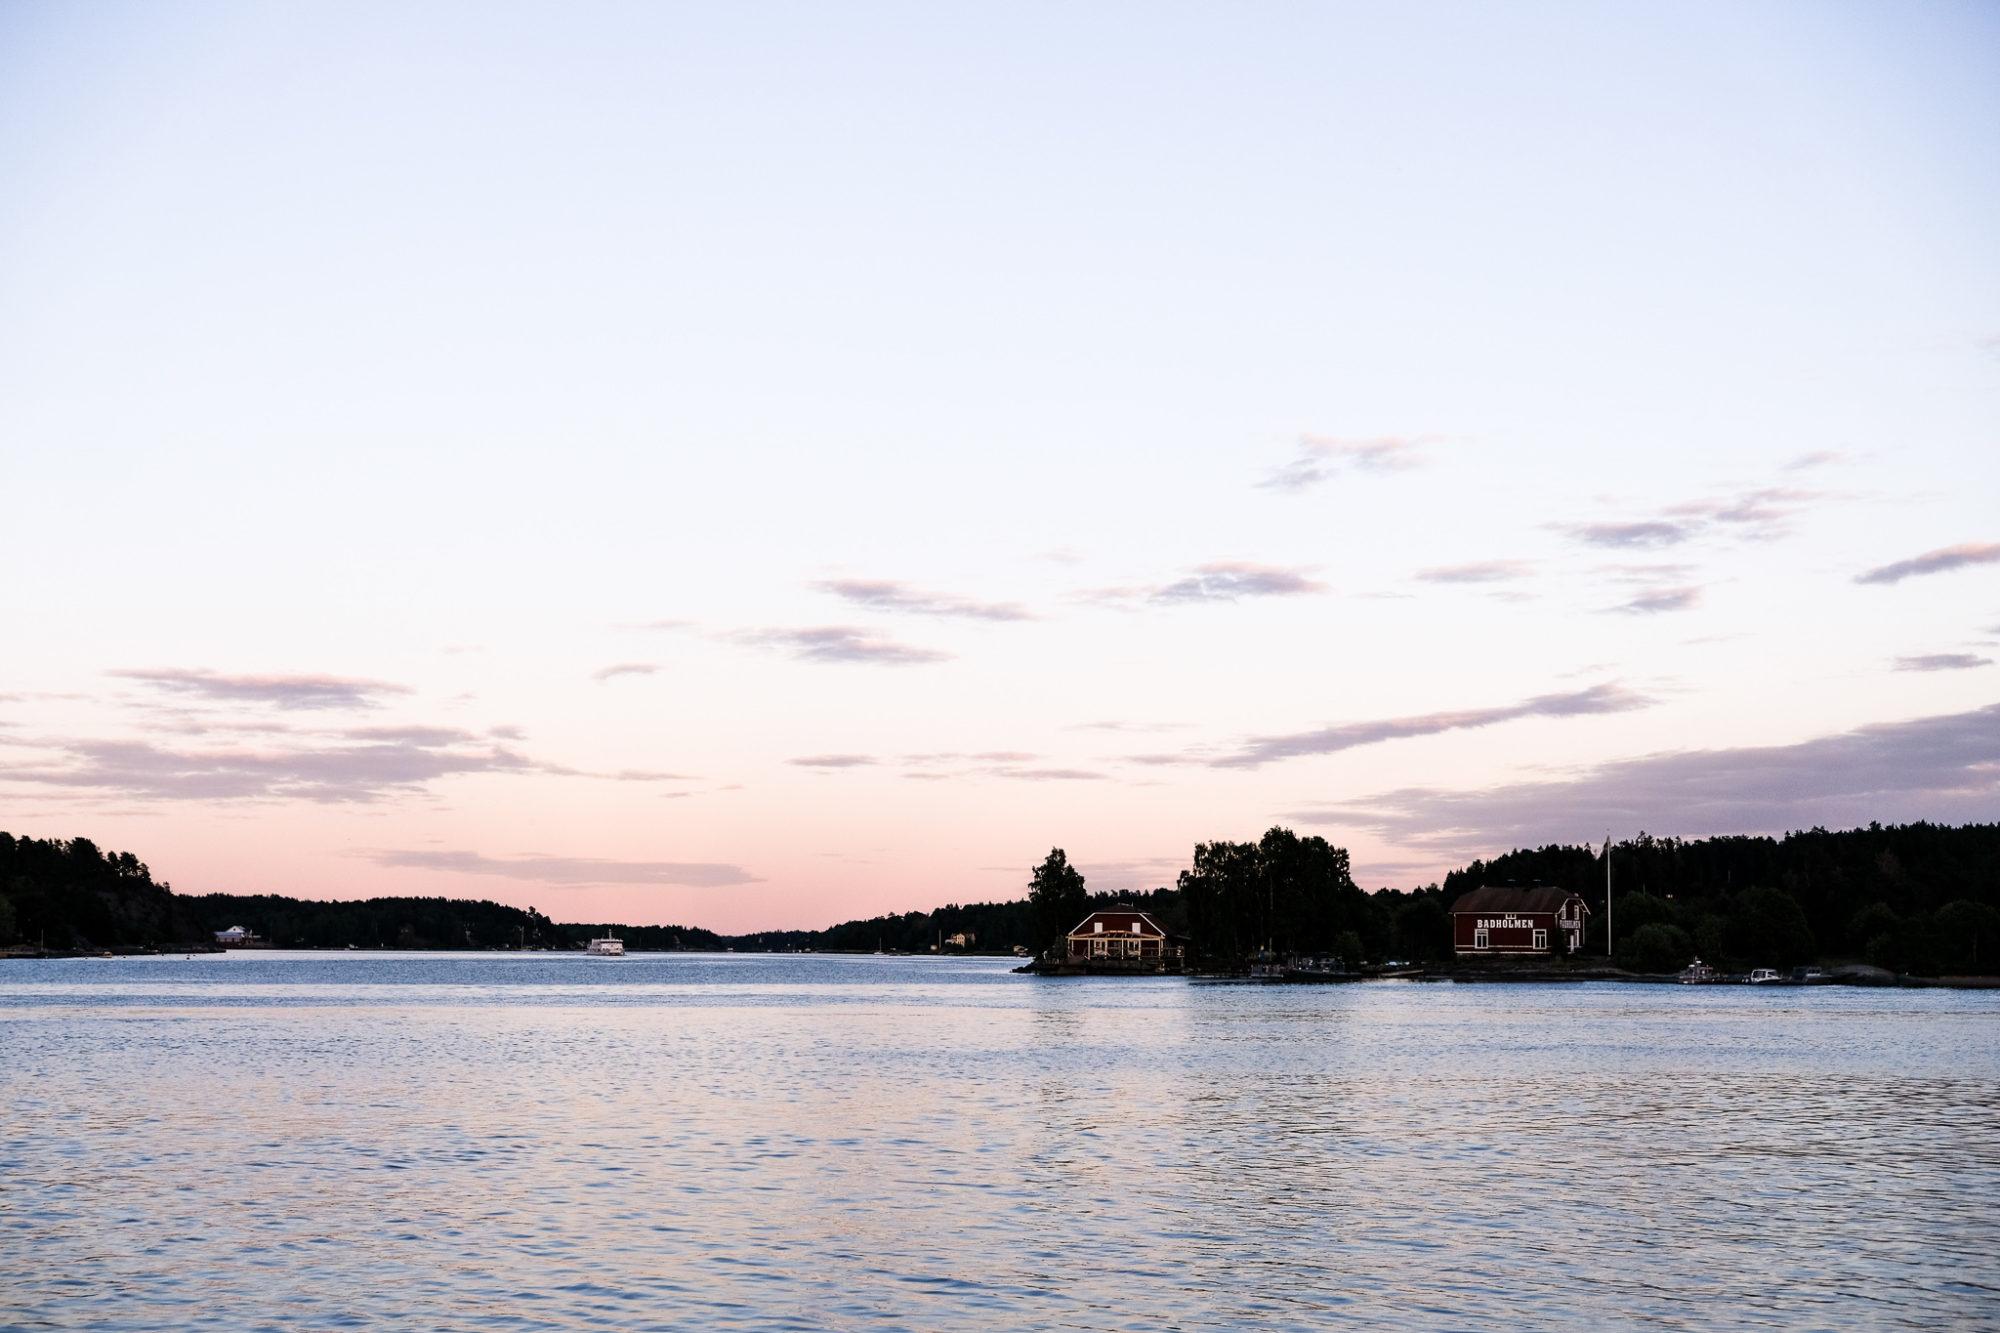 Une nuit dans la forteresse de Vaxholm